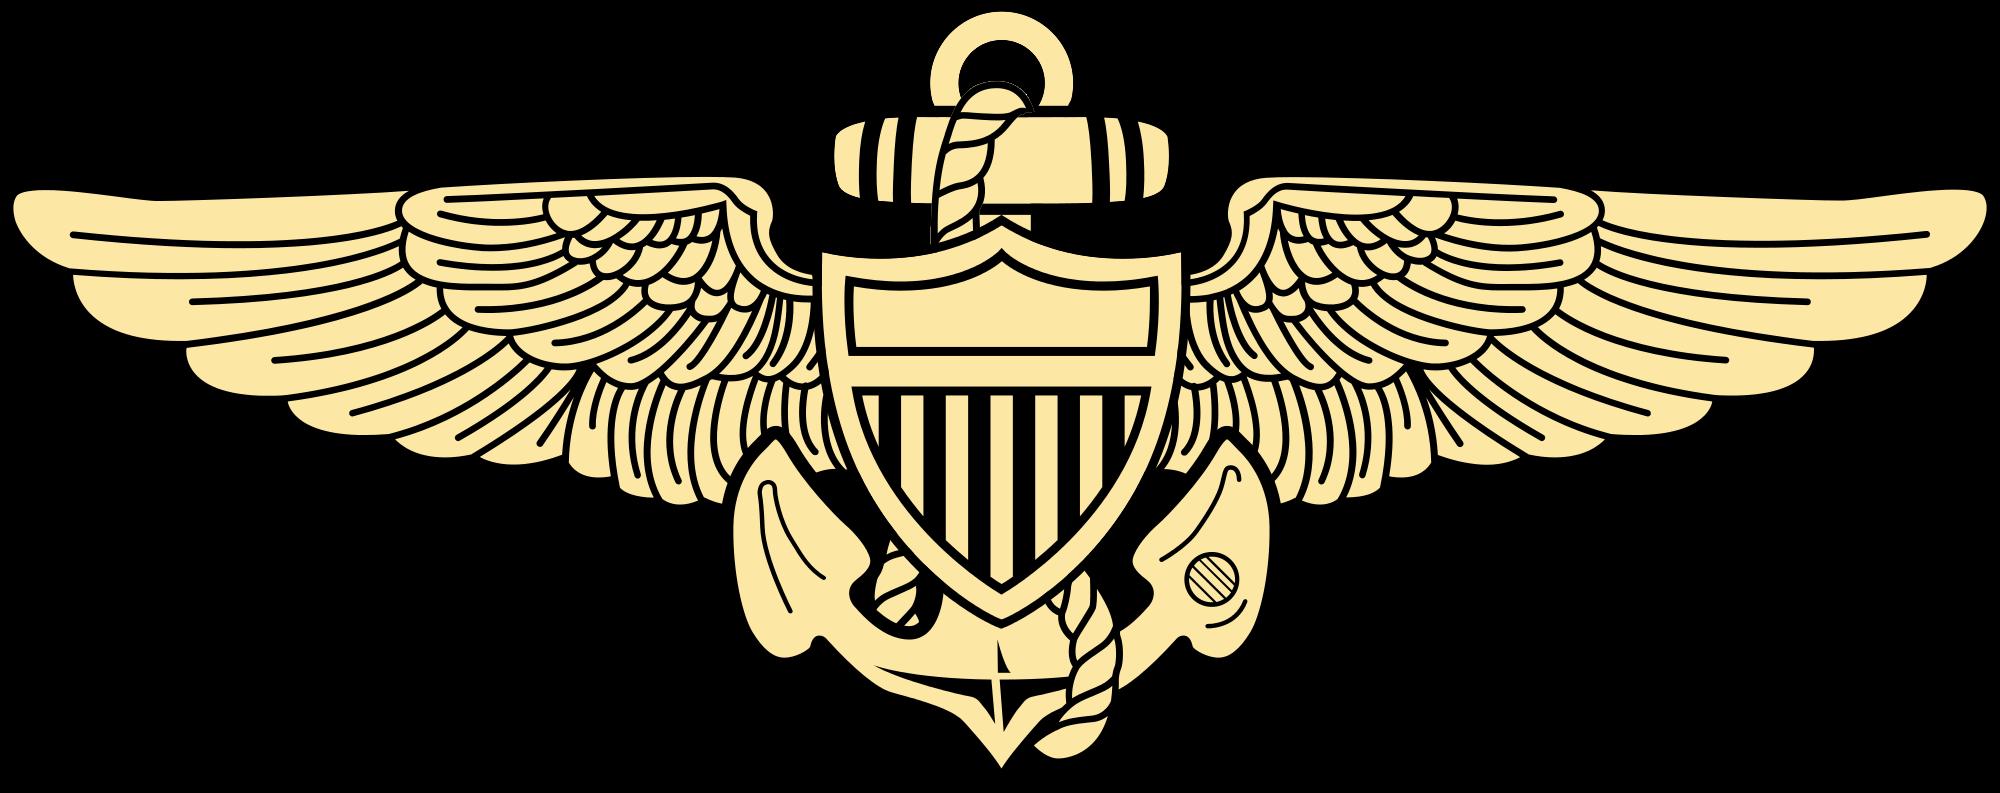 Naval svg #8, Download drawings